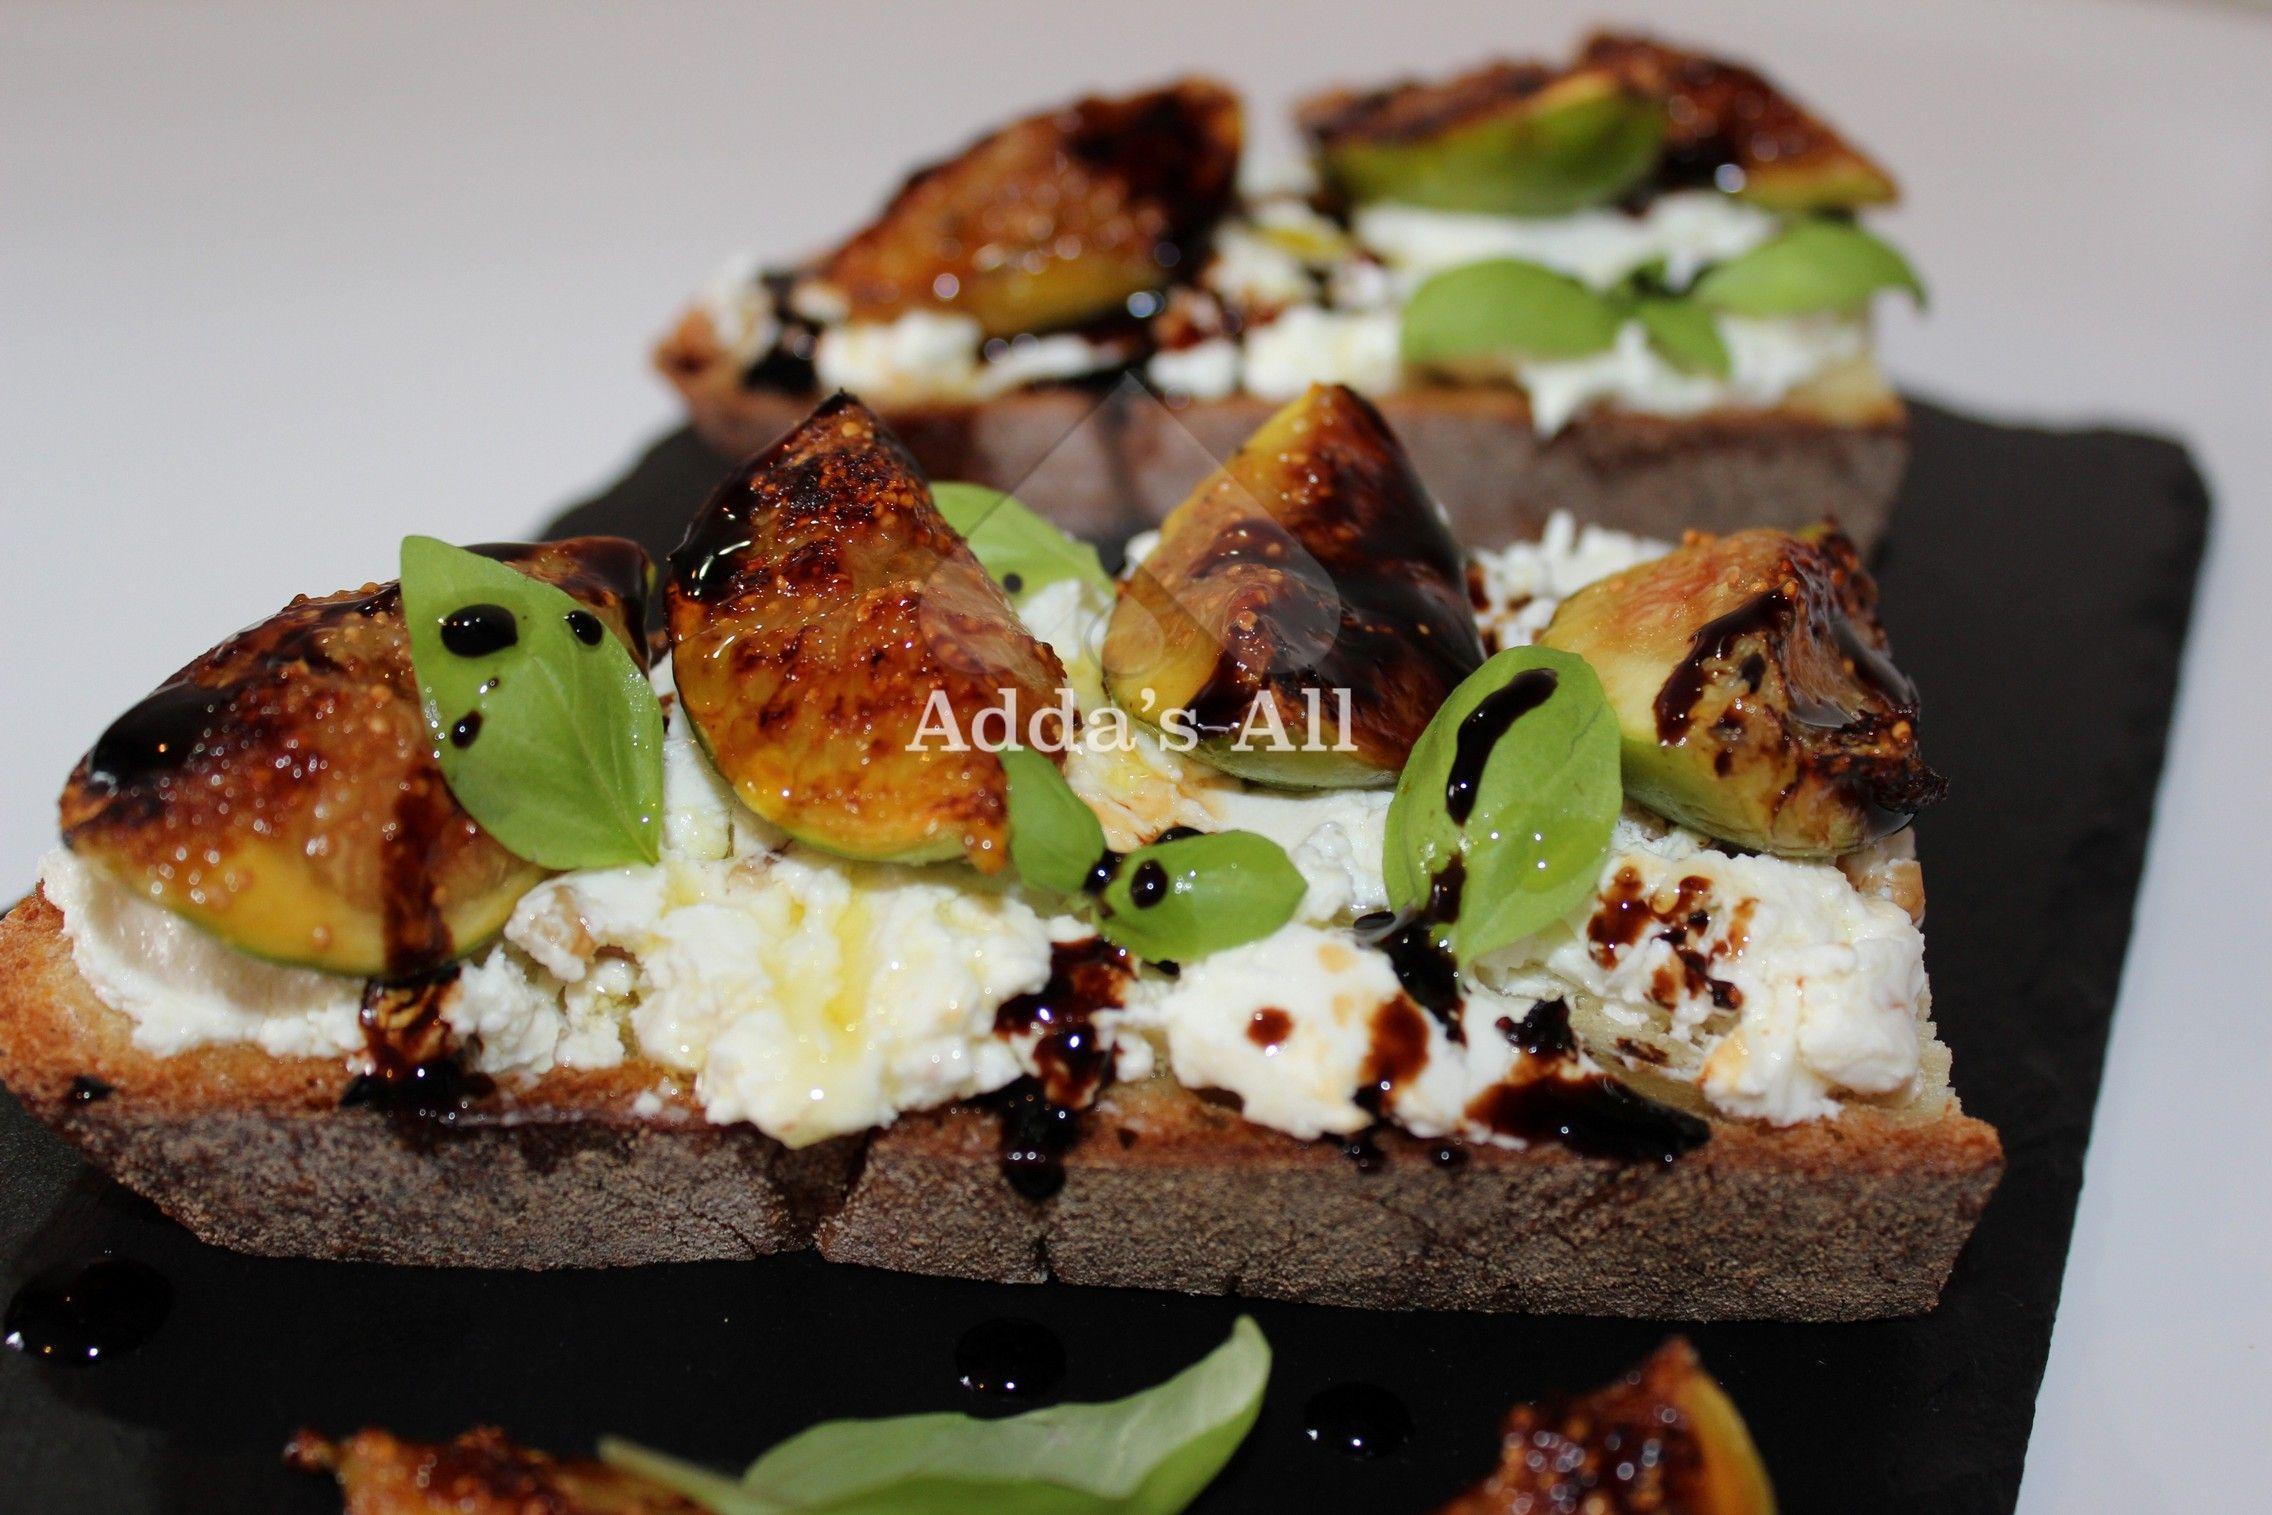 Adda s All – Brusketa me djath dhie t but dhe fiq t karamelizuar idee per cucinare Pinterest